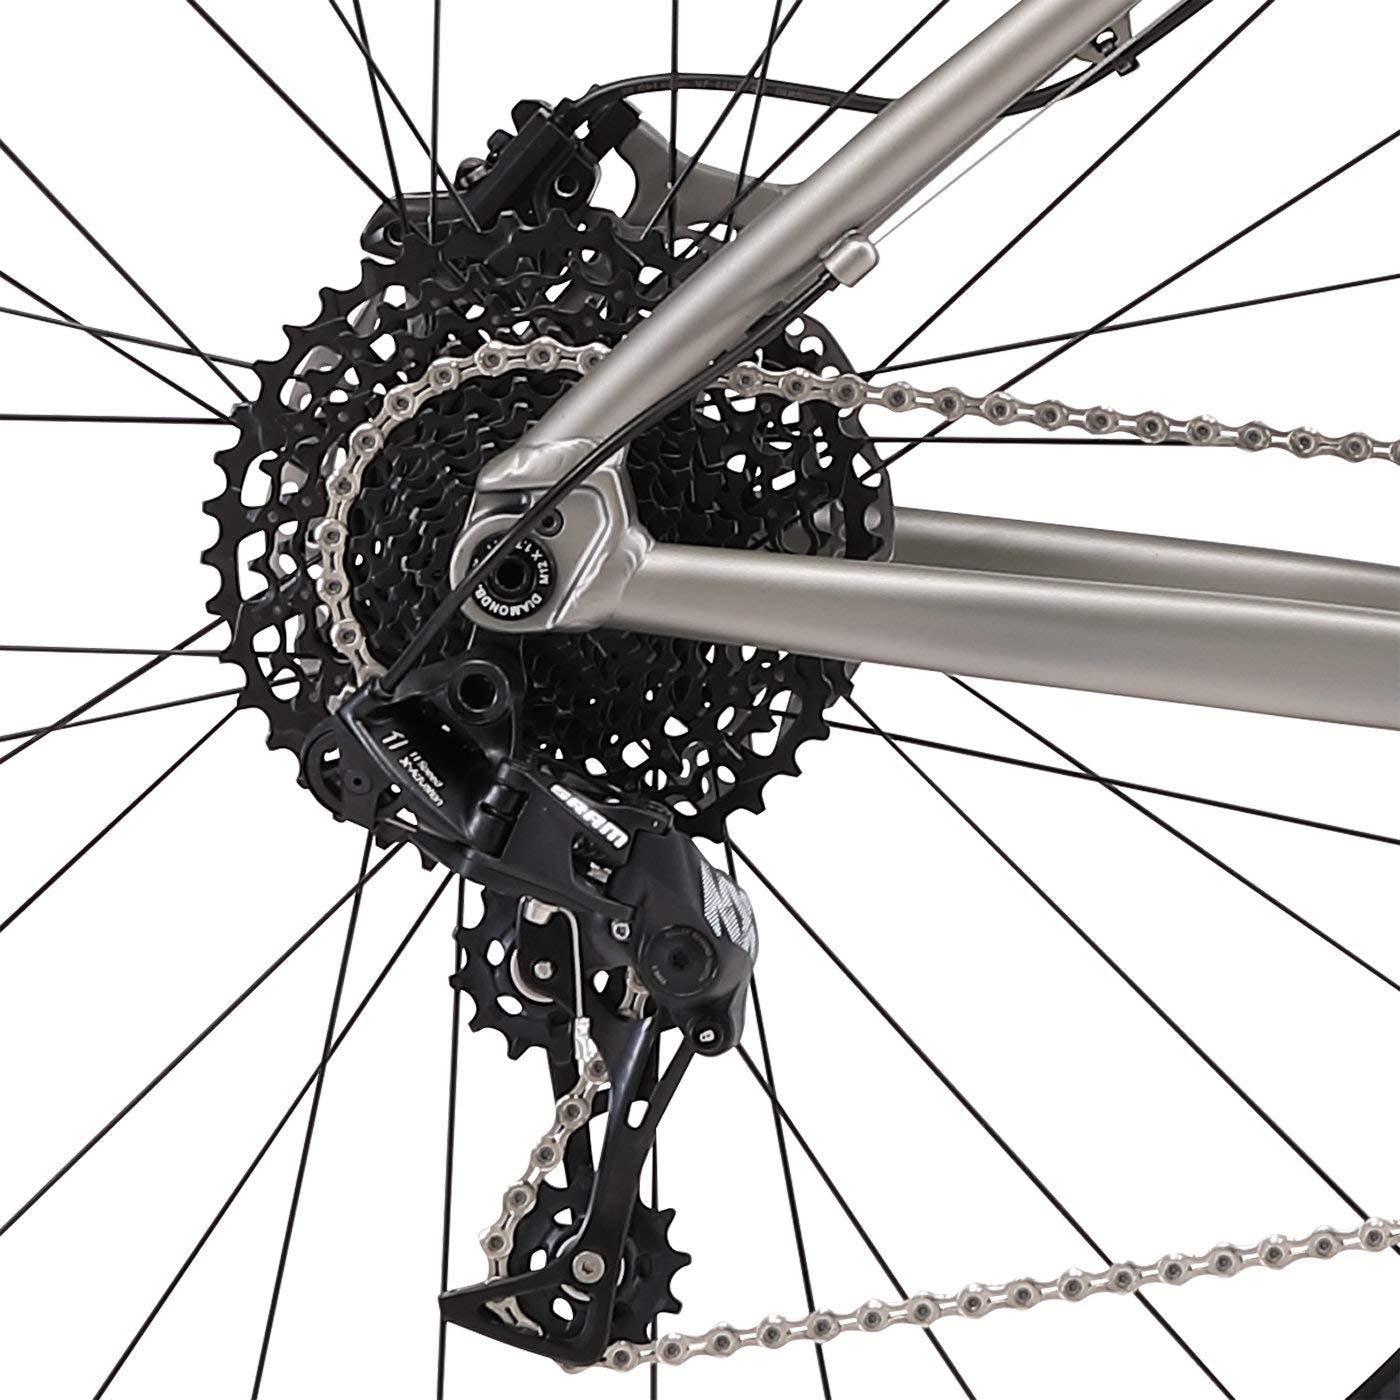 Diamondback 2019 Overdrive Carbon Pro 29 3 Mountain Bike